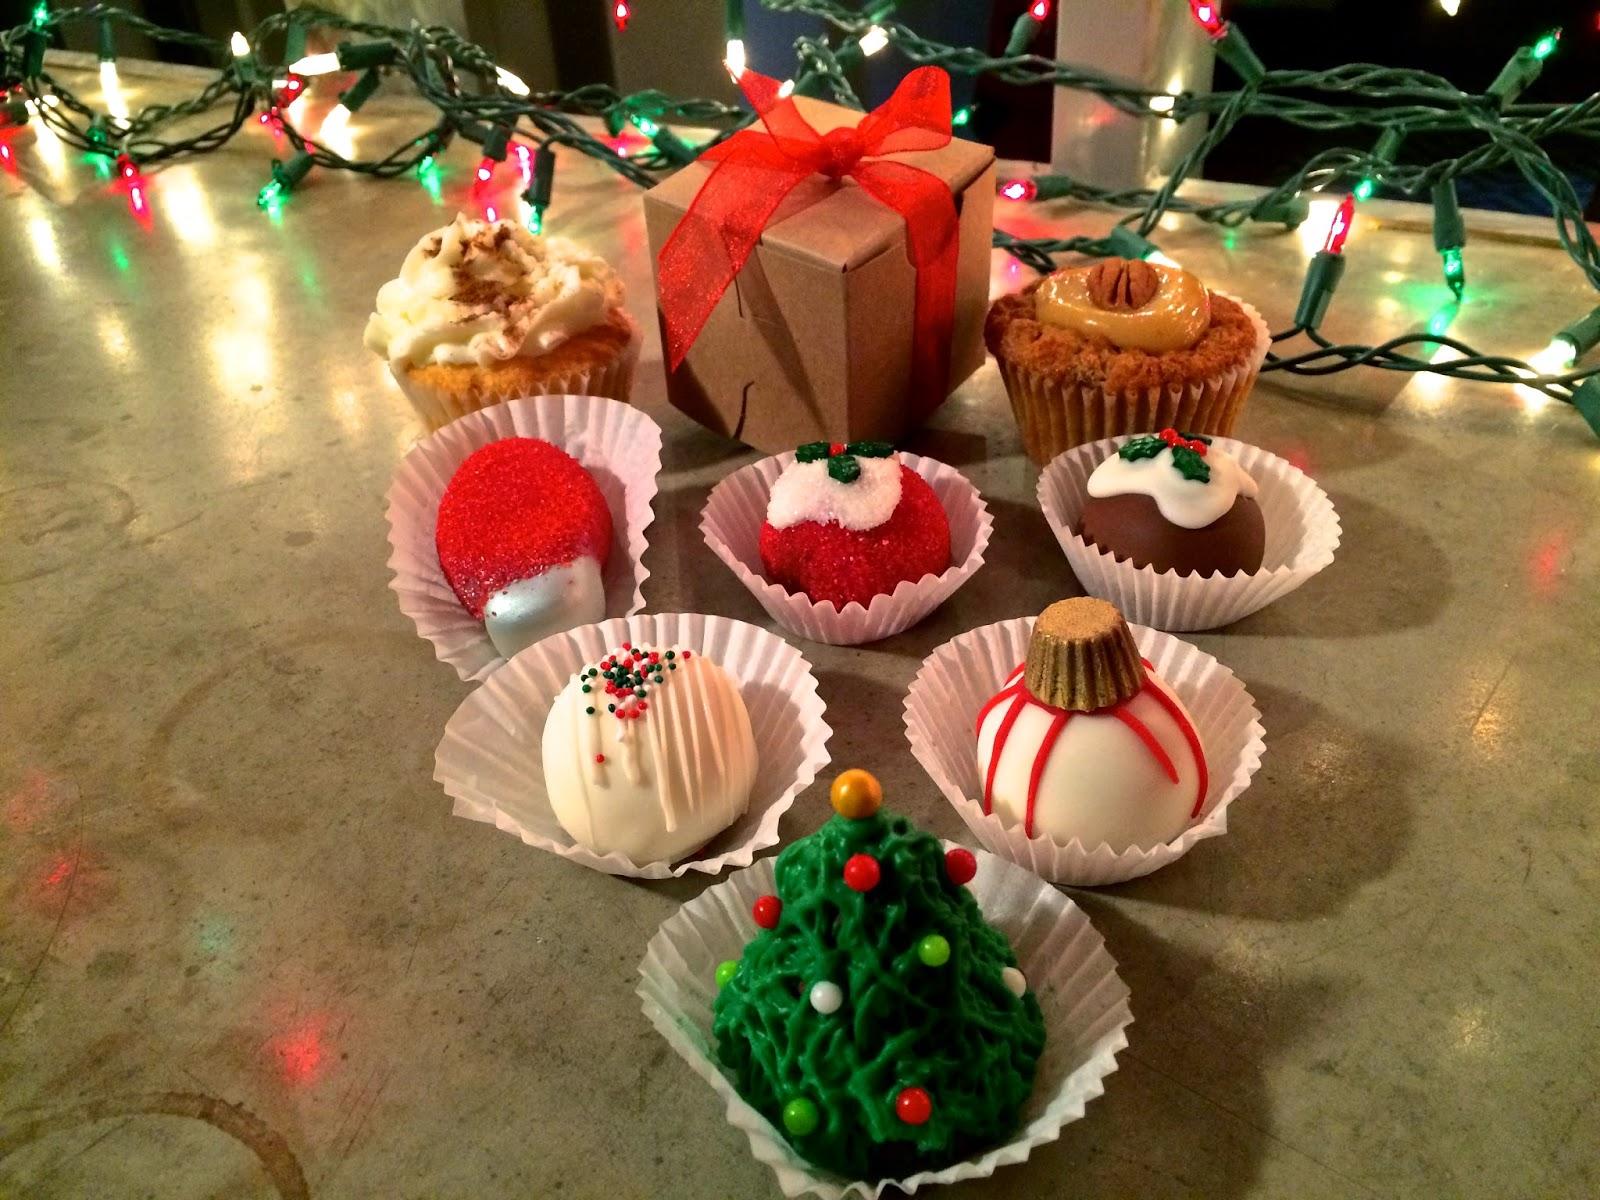 Pictured are Cupcake Allie's Pecan Pie Cupcake, Eggnog Cupcake, and Red Velvet, Vanilla, & Chocolate Cake Bites